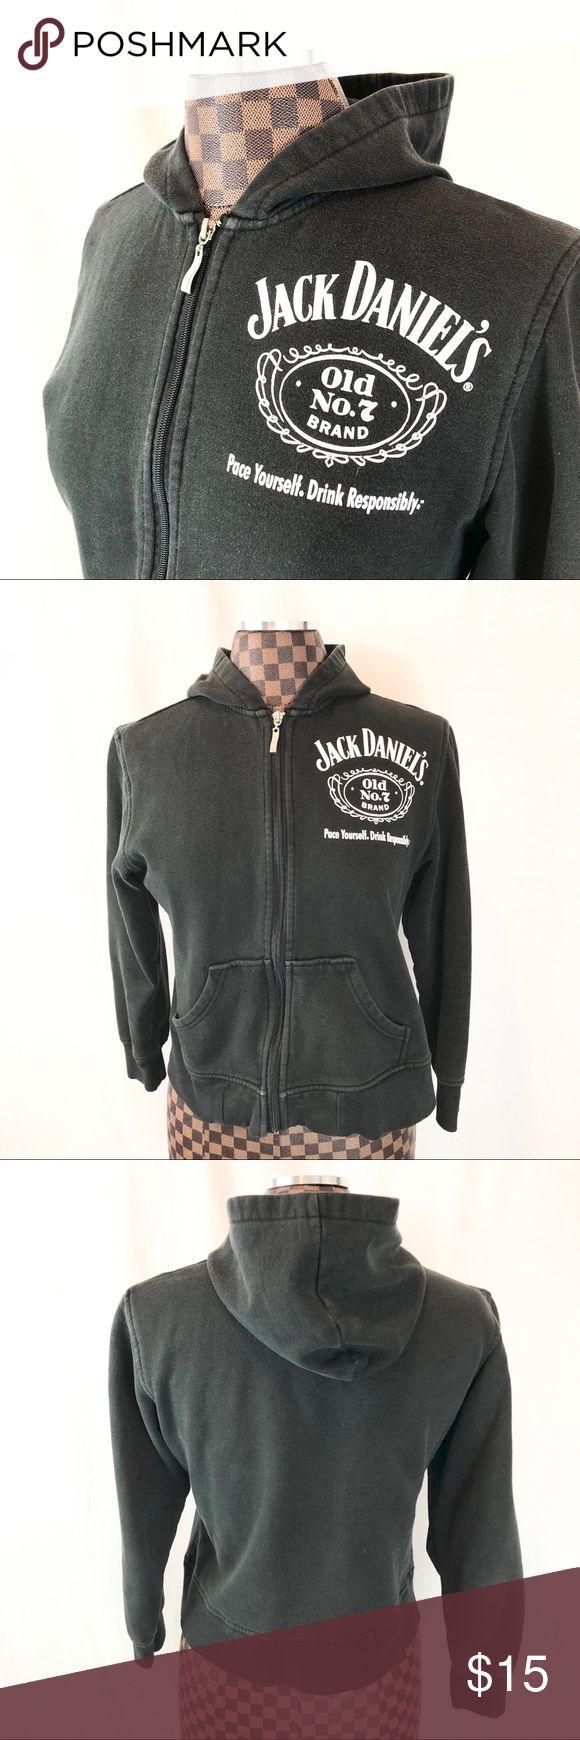 "Jack Daniels Black Hoodie NASCAR Chase Authentics Cute black Jack Daniels hoodie by Chase Authentics  Size Medium  Fabric has some heavy fading  Bust 37""  Shoulder to Shoulder 16""  Shoulder to Hem 20""  Waist 38""  Sleeve 20"" Tops Sweatshirts & Hoodies"